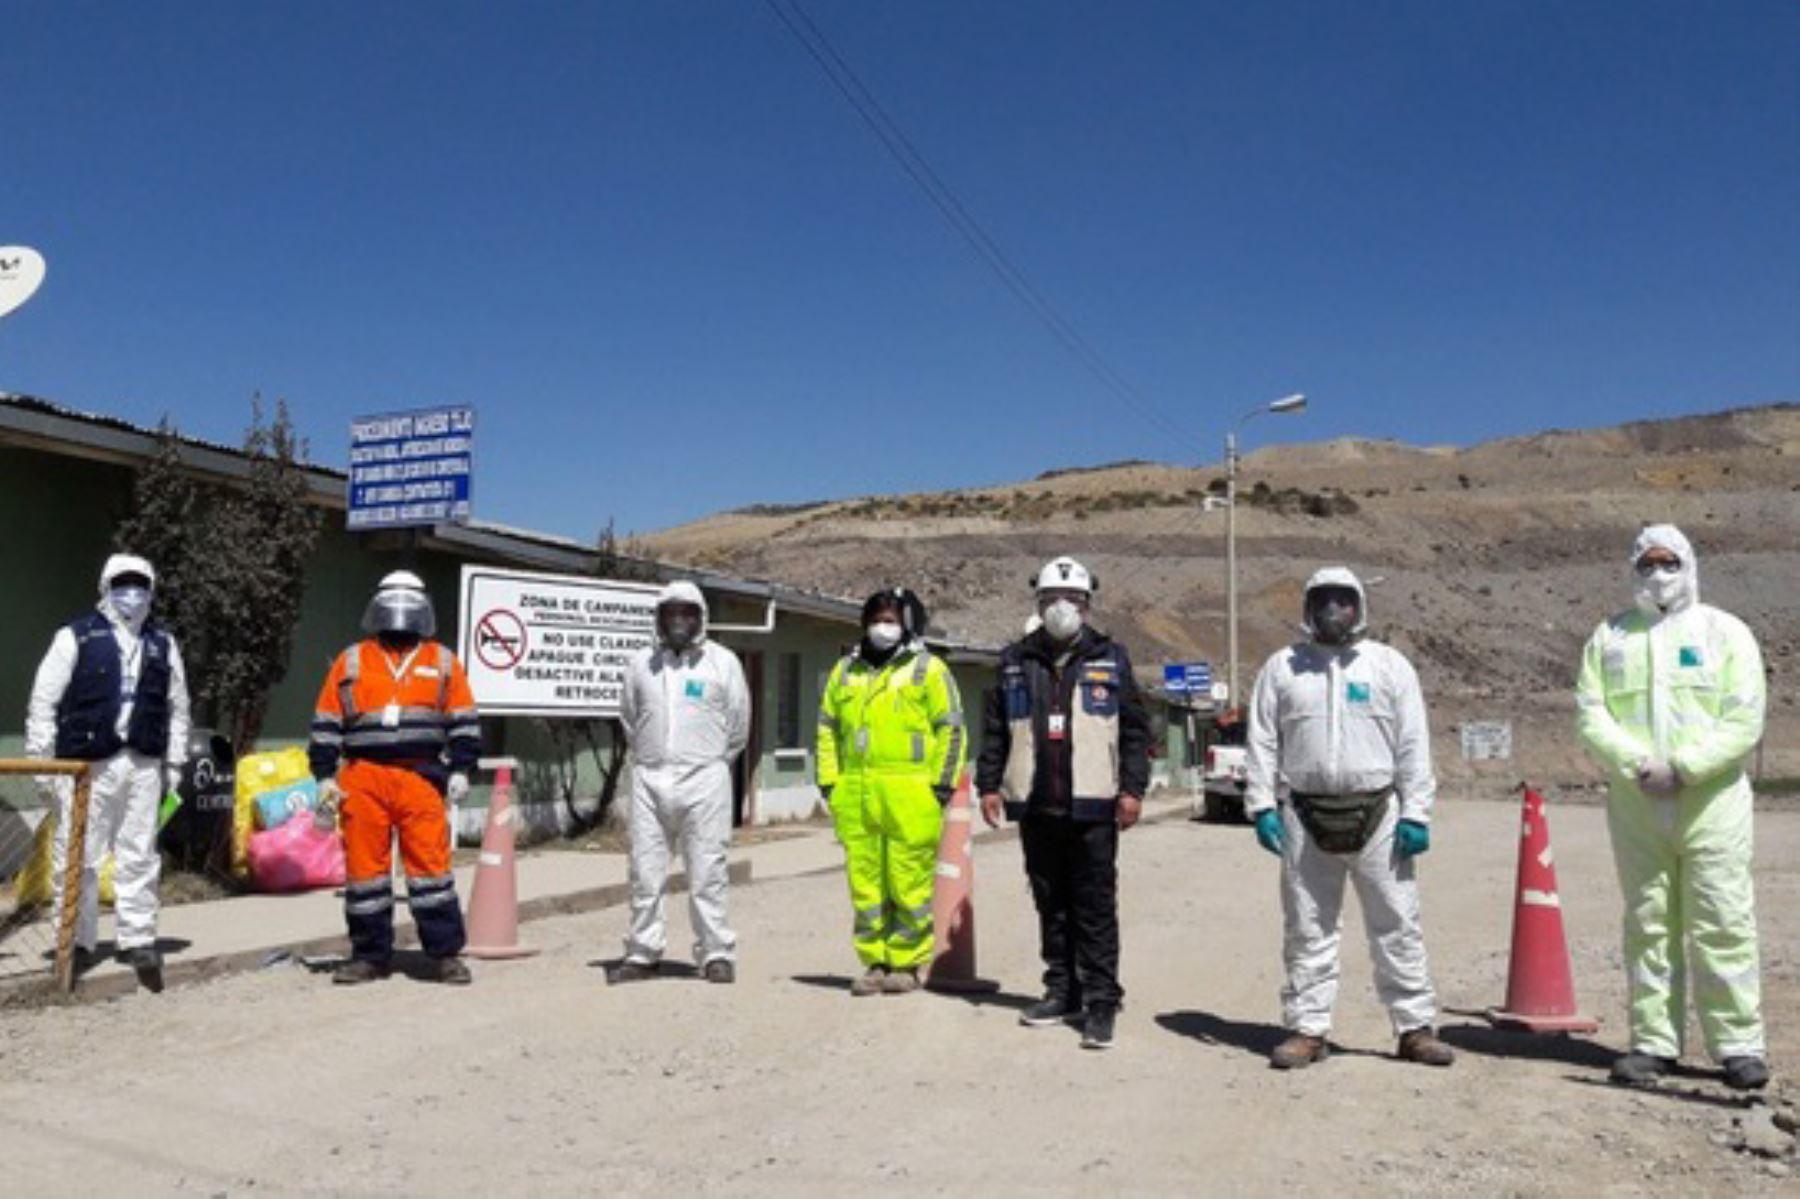 El titular de la Dirección Regional de Energía, Minas e Hidrocarburos Pasco, Juan Rojas, visitó la contrata minera JRC, que brinda servicios a la empresa minera El Brocal. Foto: ANDINA/Difusión